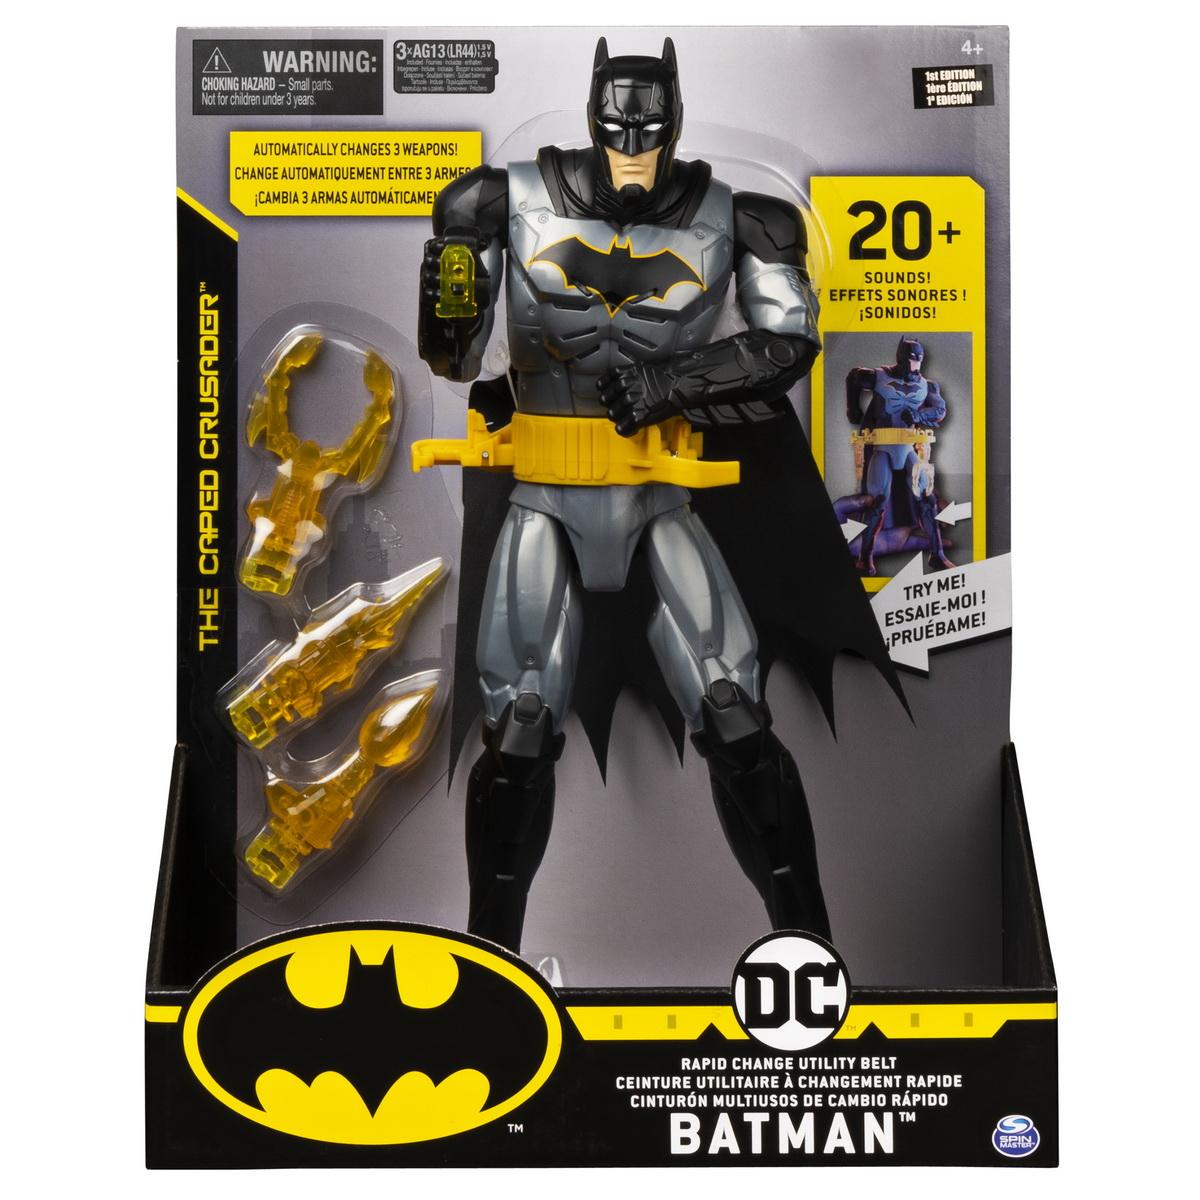 Batman Figurina 29cm Deluxe Cu Accesorii Si Fraze In Limba Engleza